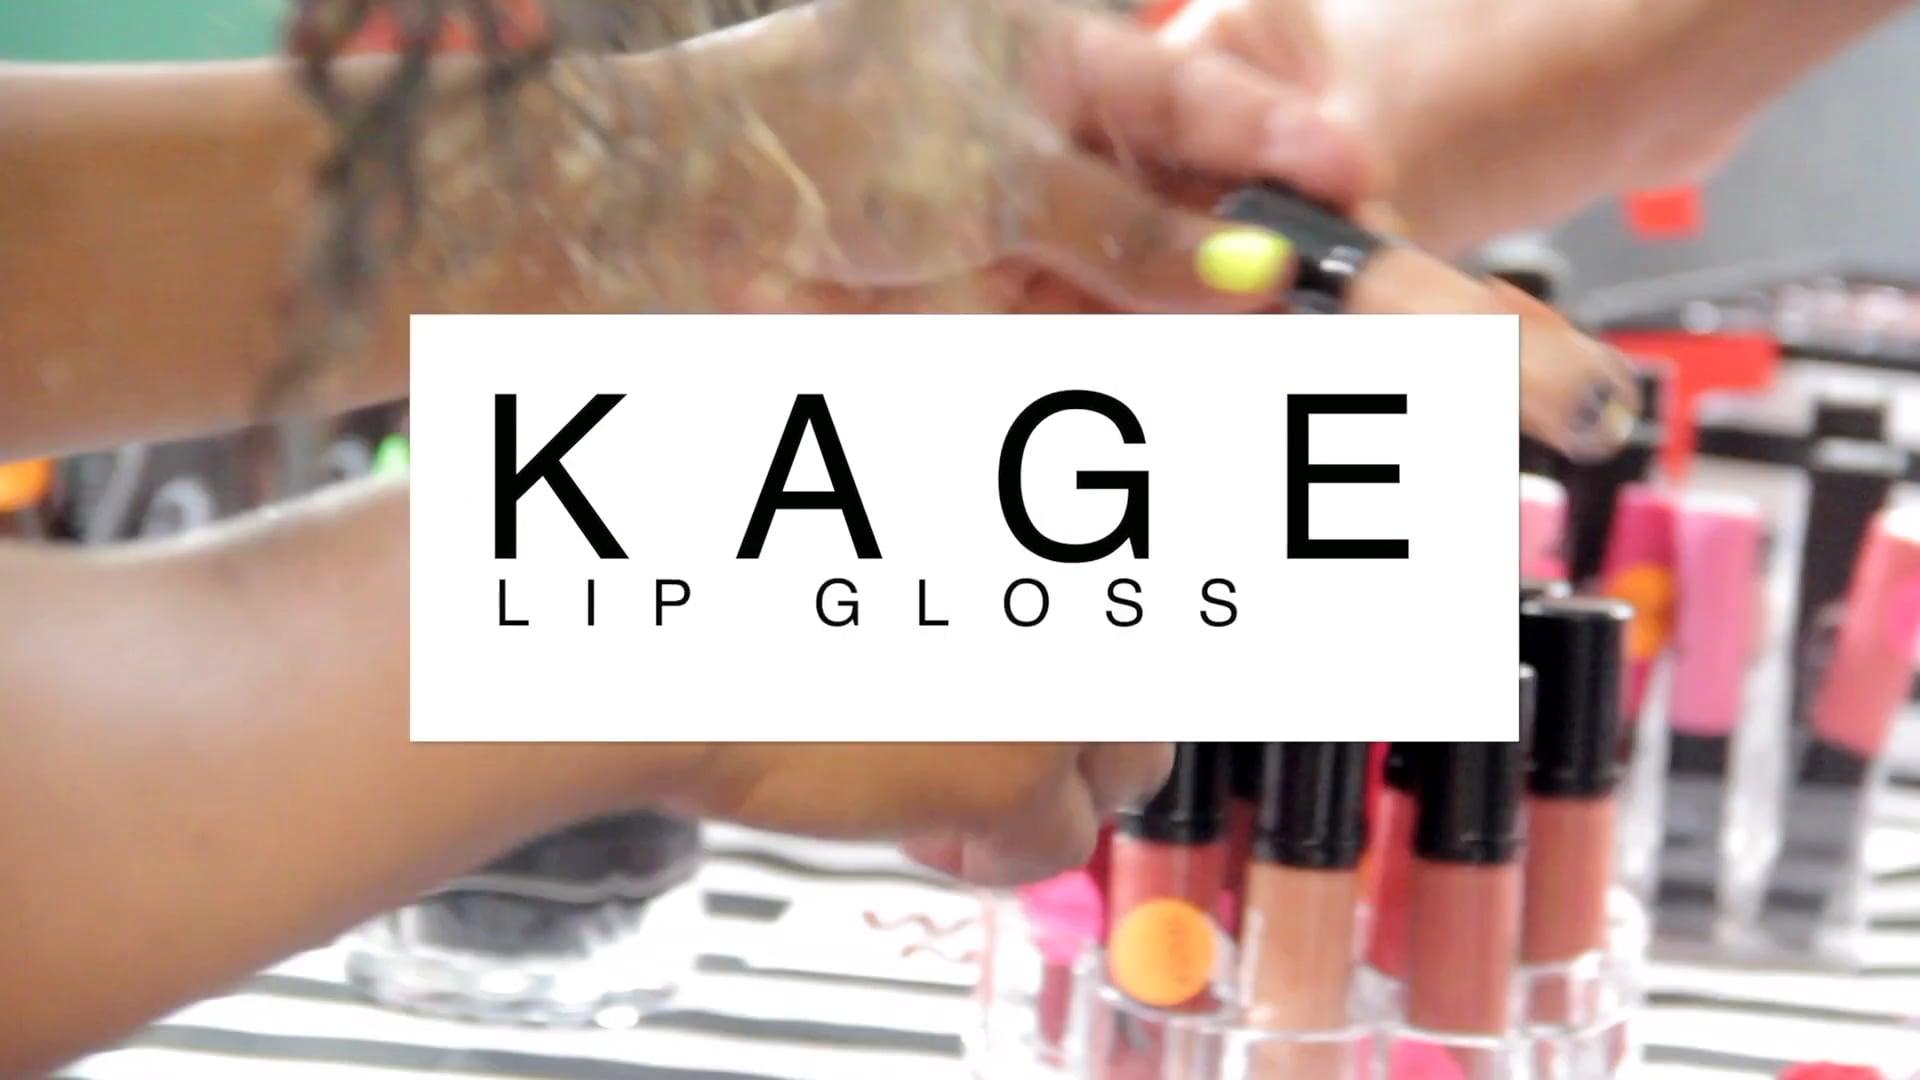 Kage Lip Gloss Live Vendor Experience